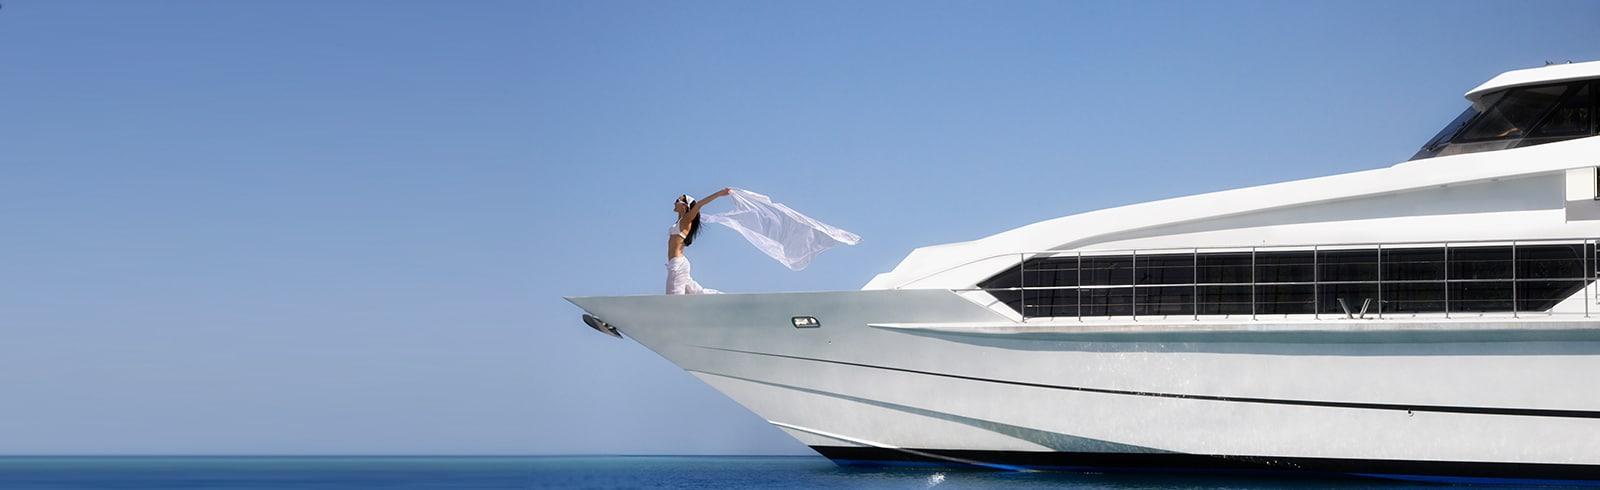 Smart payment plan masthead lifestyle sea woman yacht water free